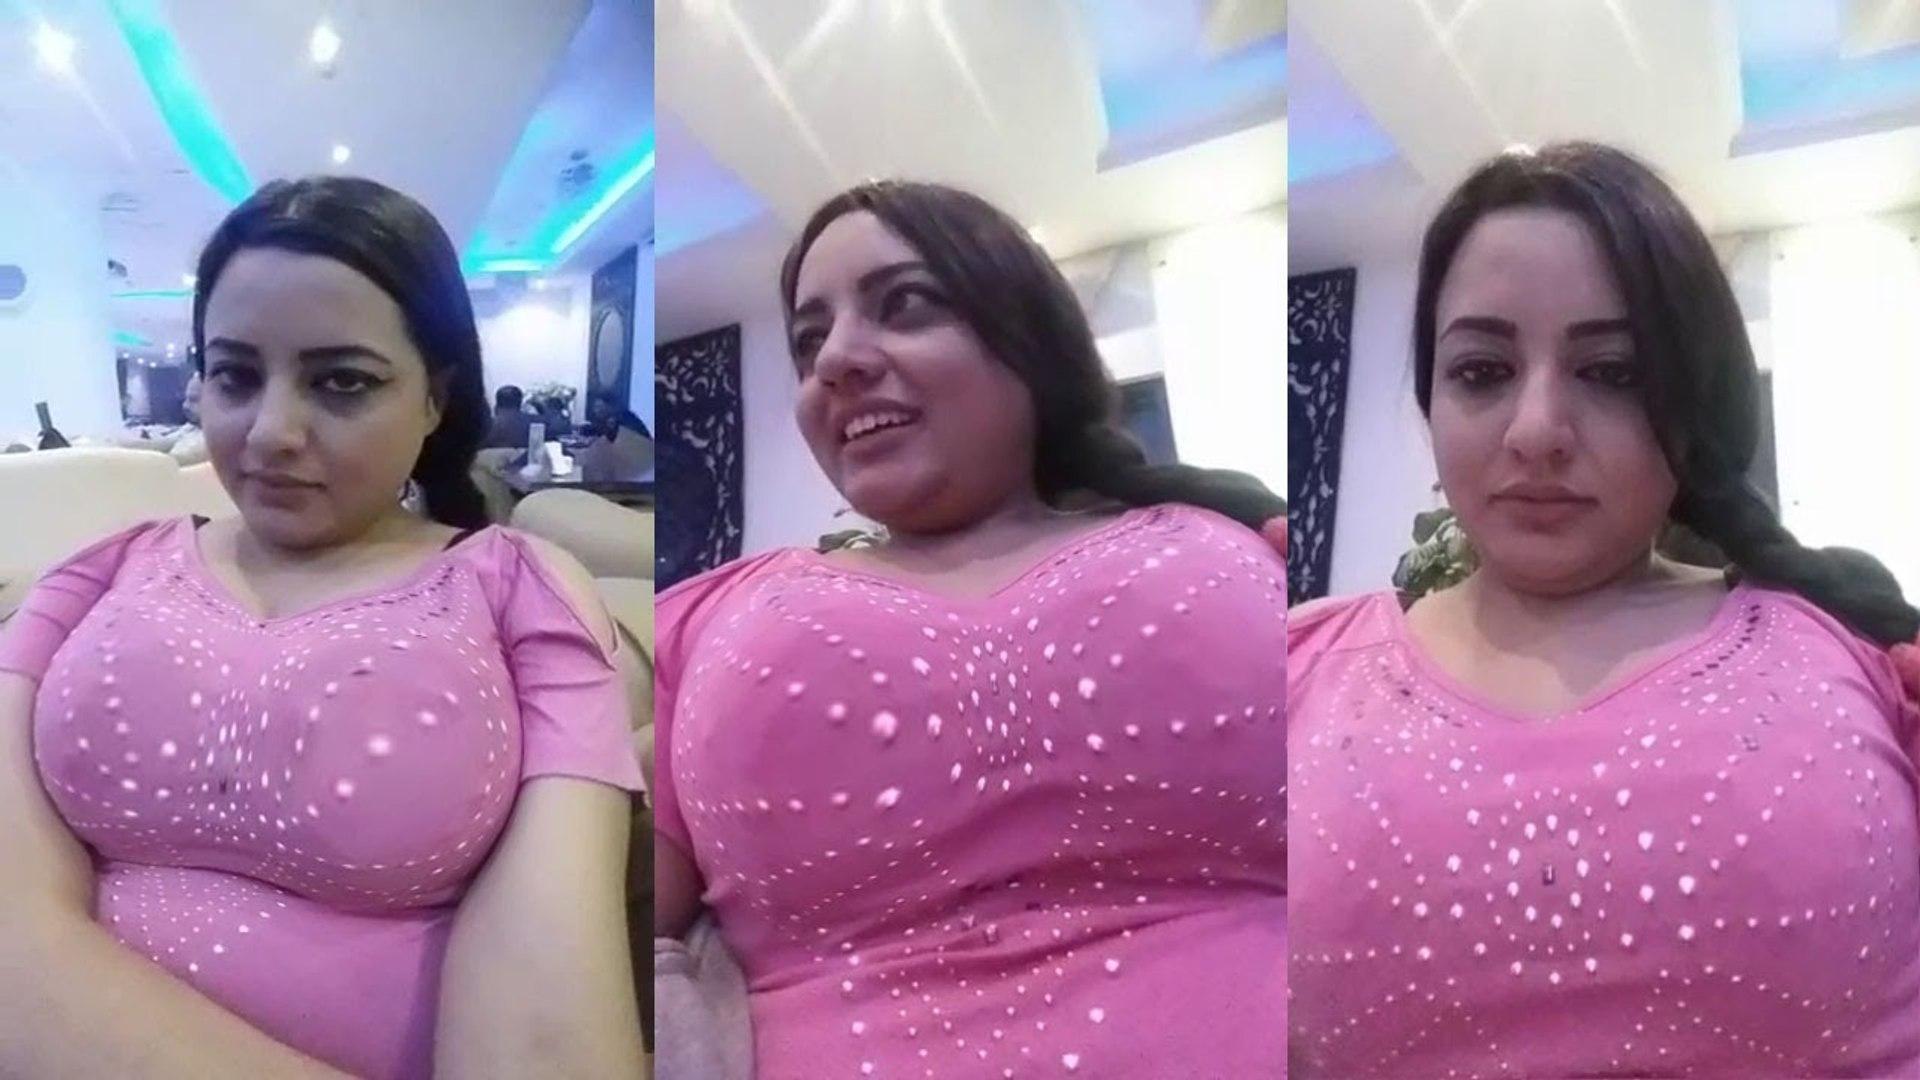 bigo live video | facebook live ad | bigo live update | #6